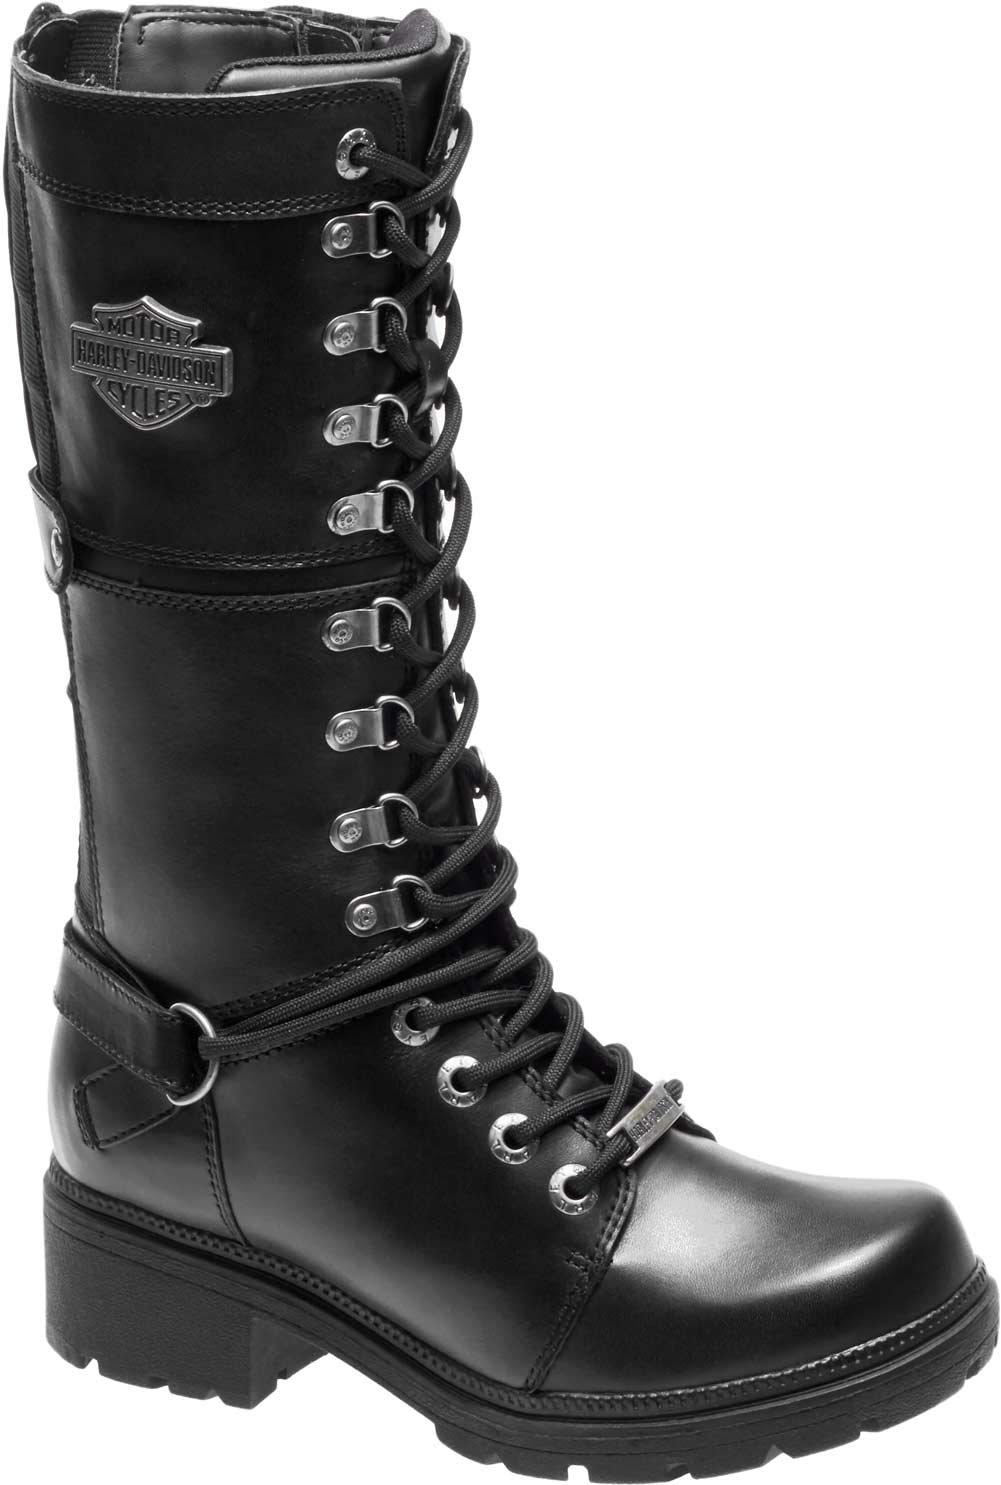 HARLEY-DAVIDSON Women's Harland Work Boot, Black, 8 M US by HARLEY-DAVIDSON